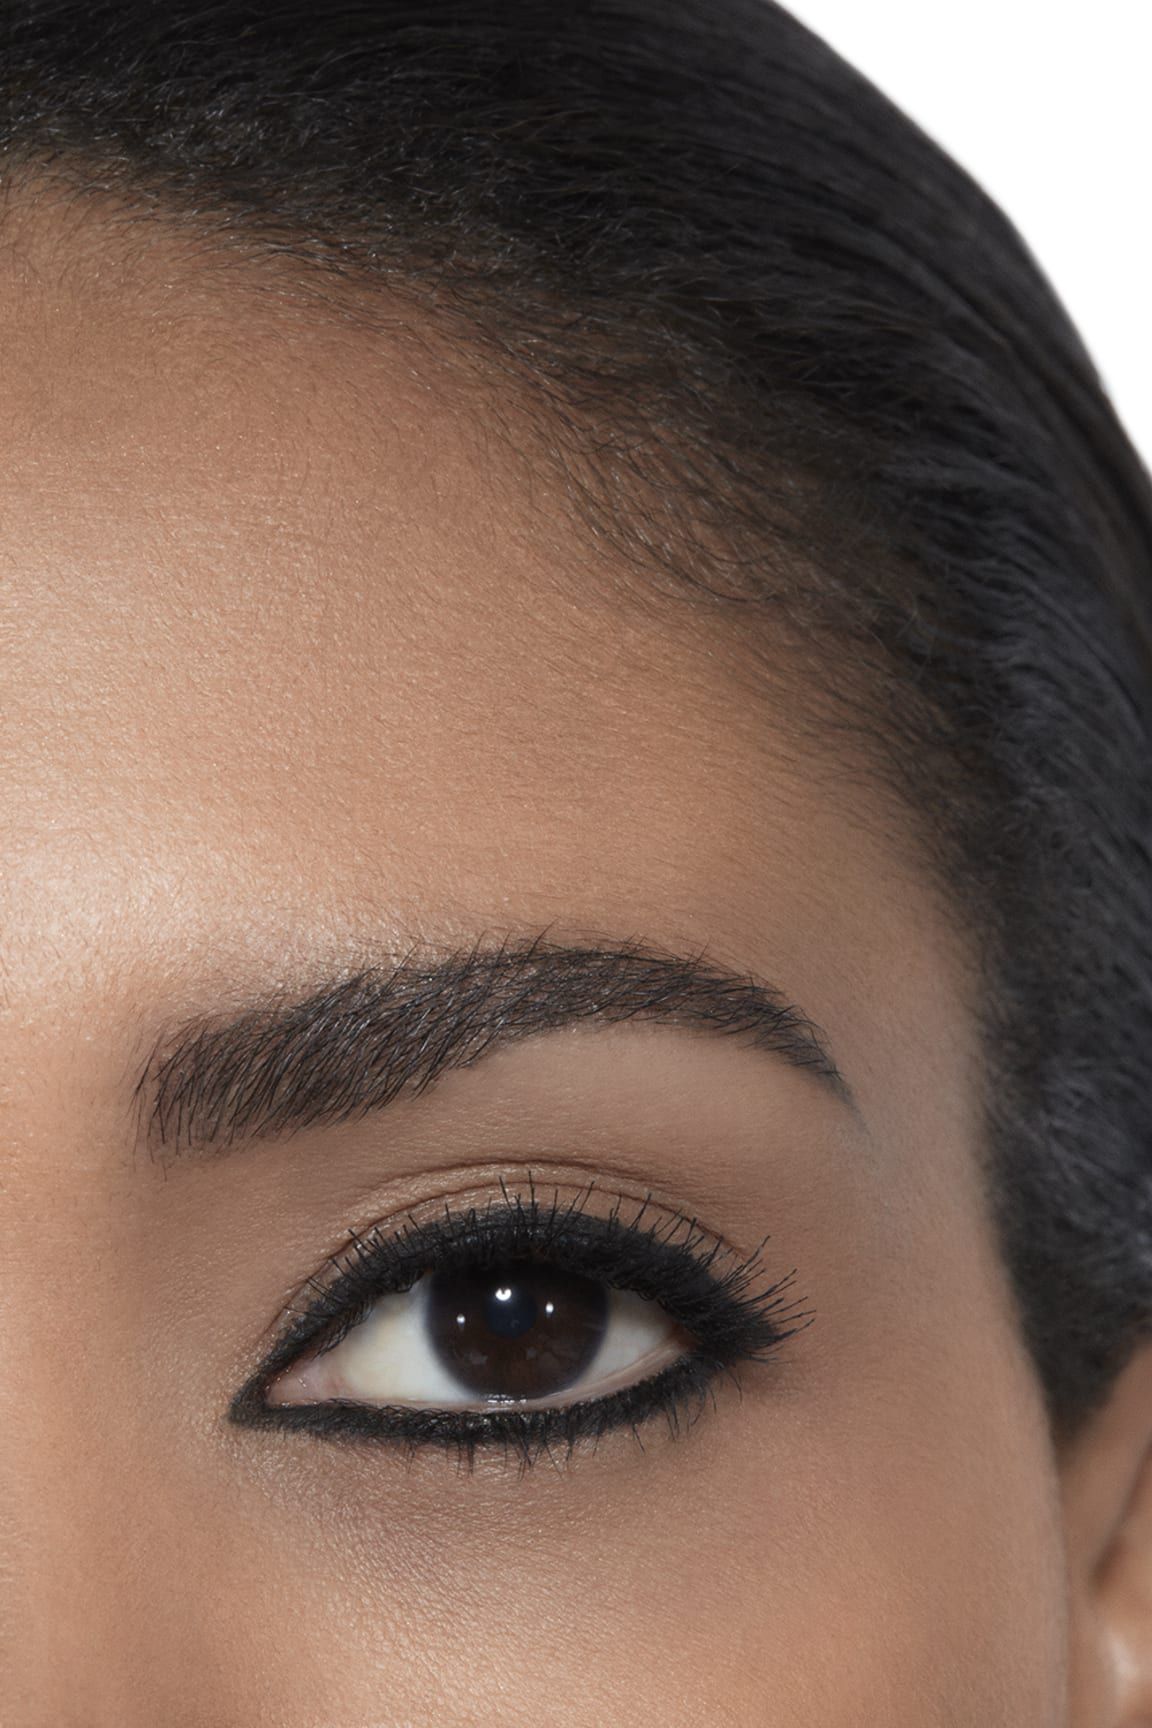 Application makeup visual 2 - STYLO YEUX WATERPROOF 10 - ÉBÈNE